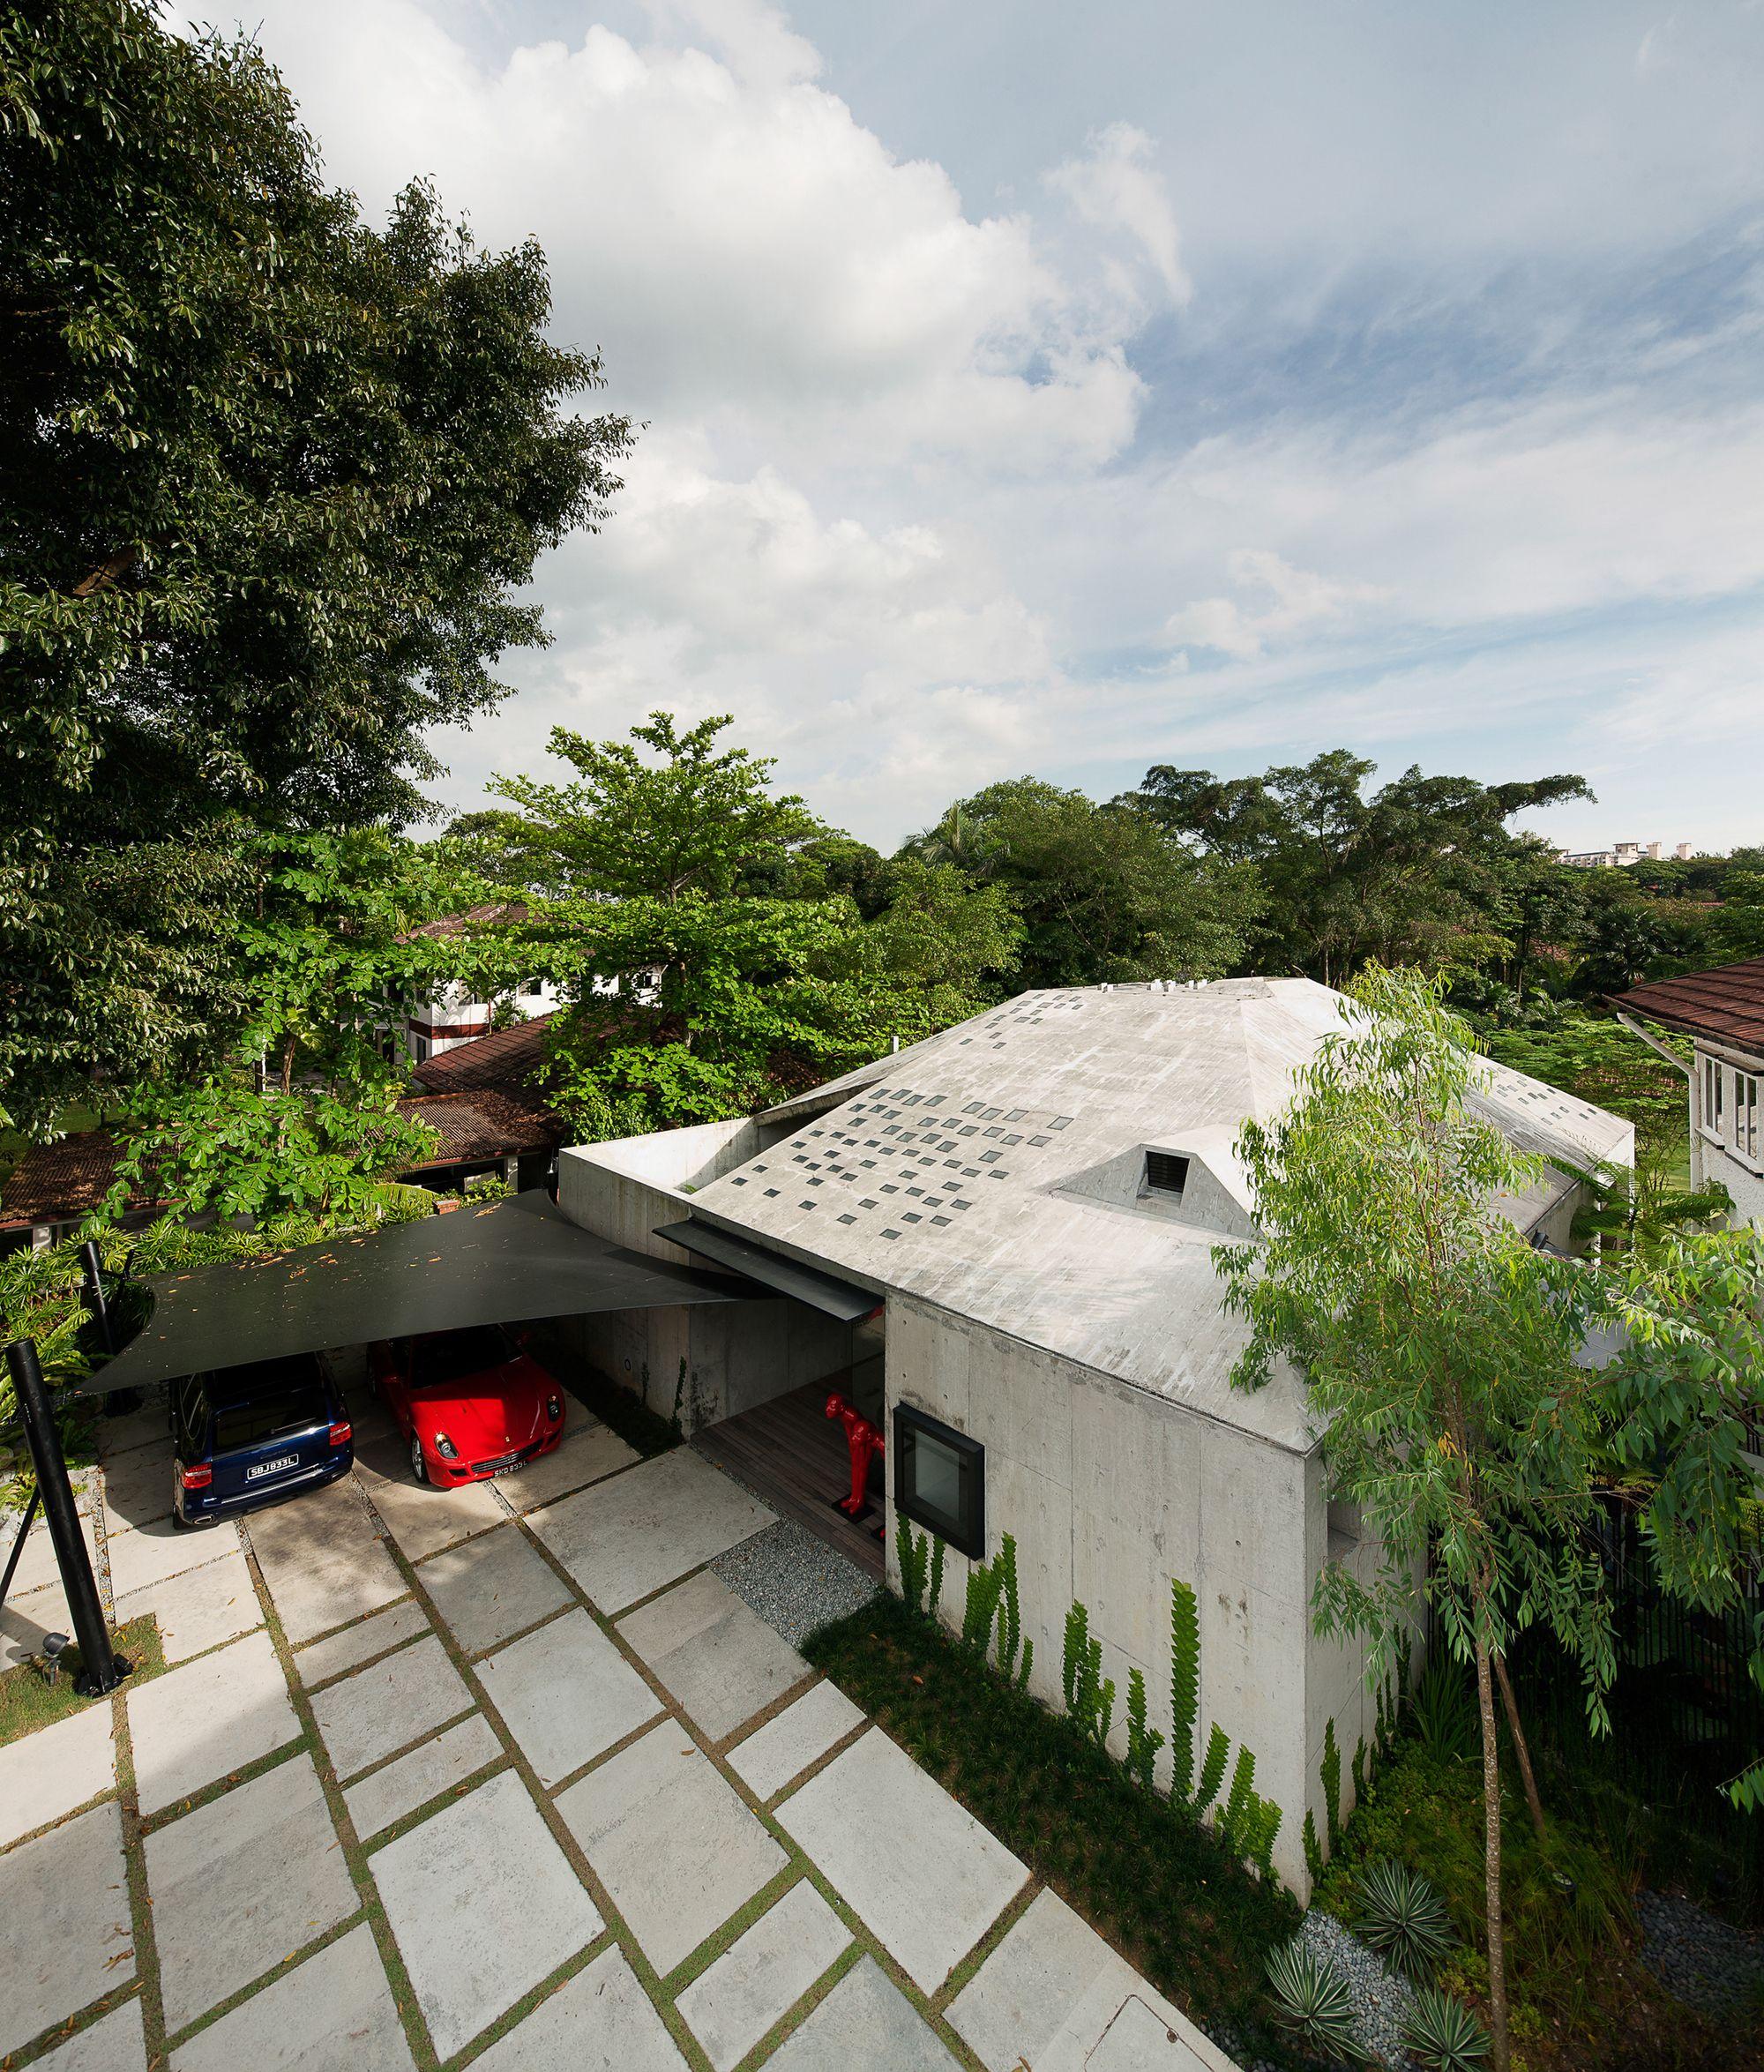 9 Leedon Park Ipli Architects Architecture Residential Architecture Concrete House